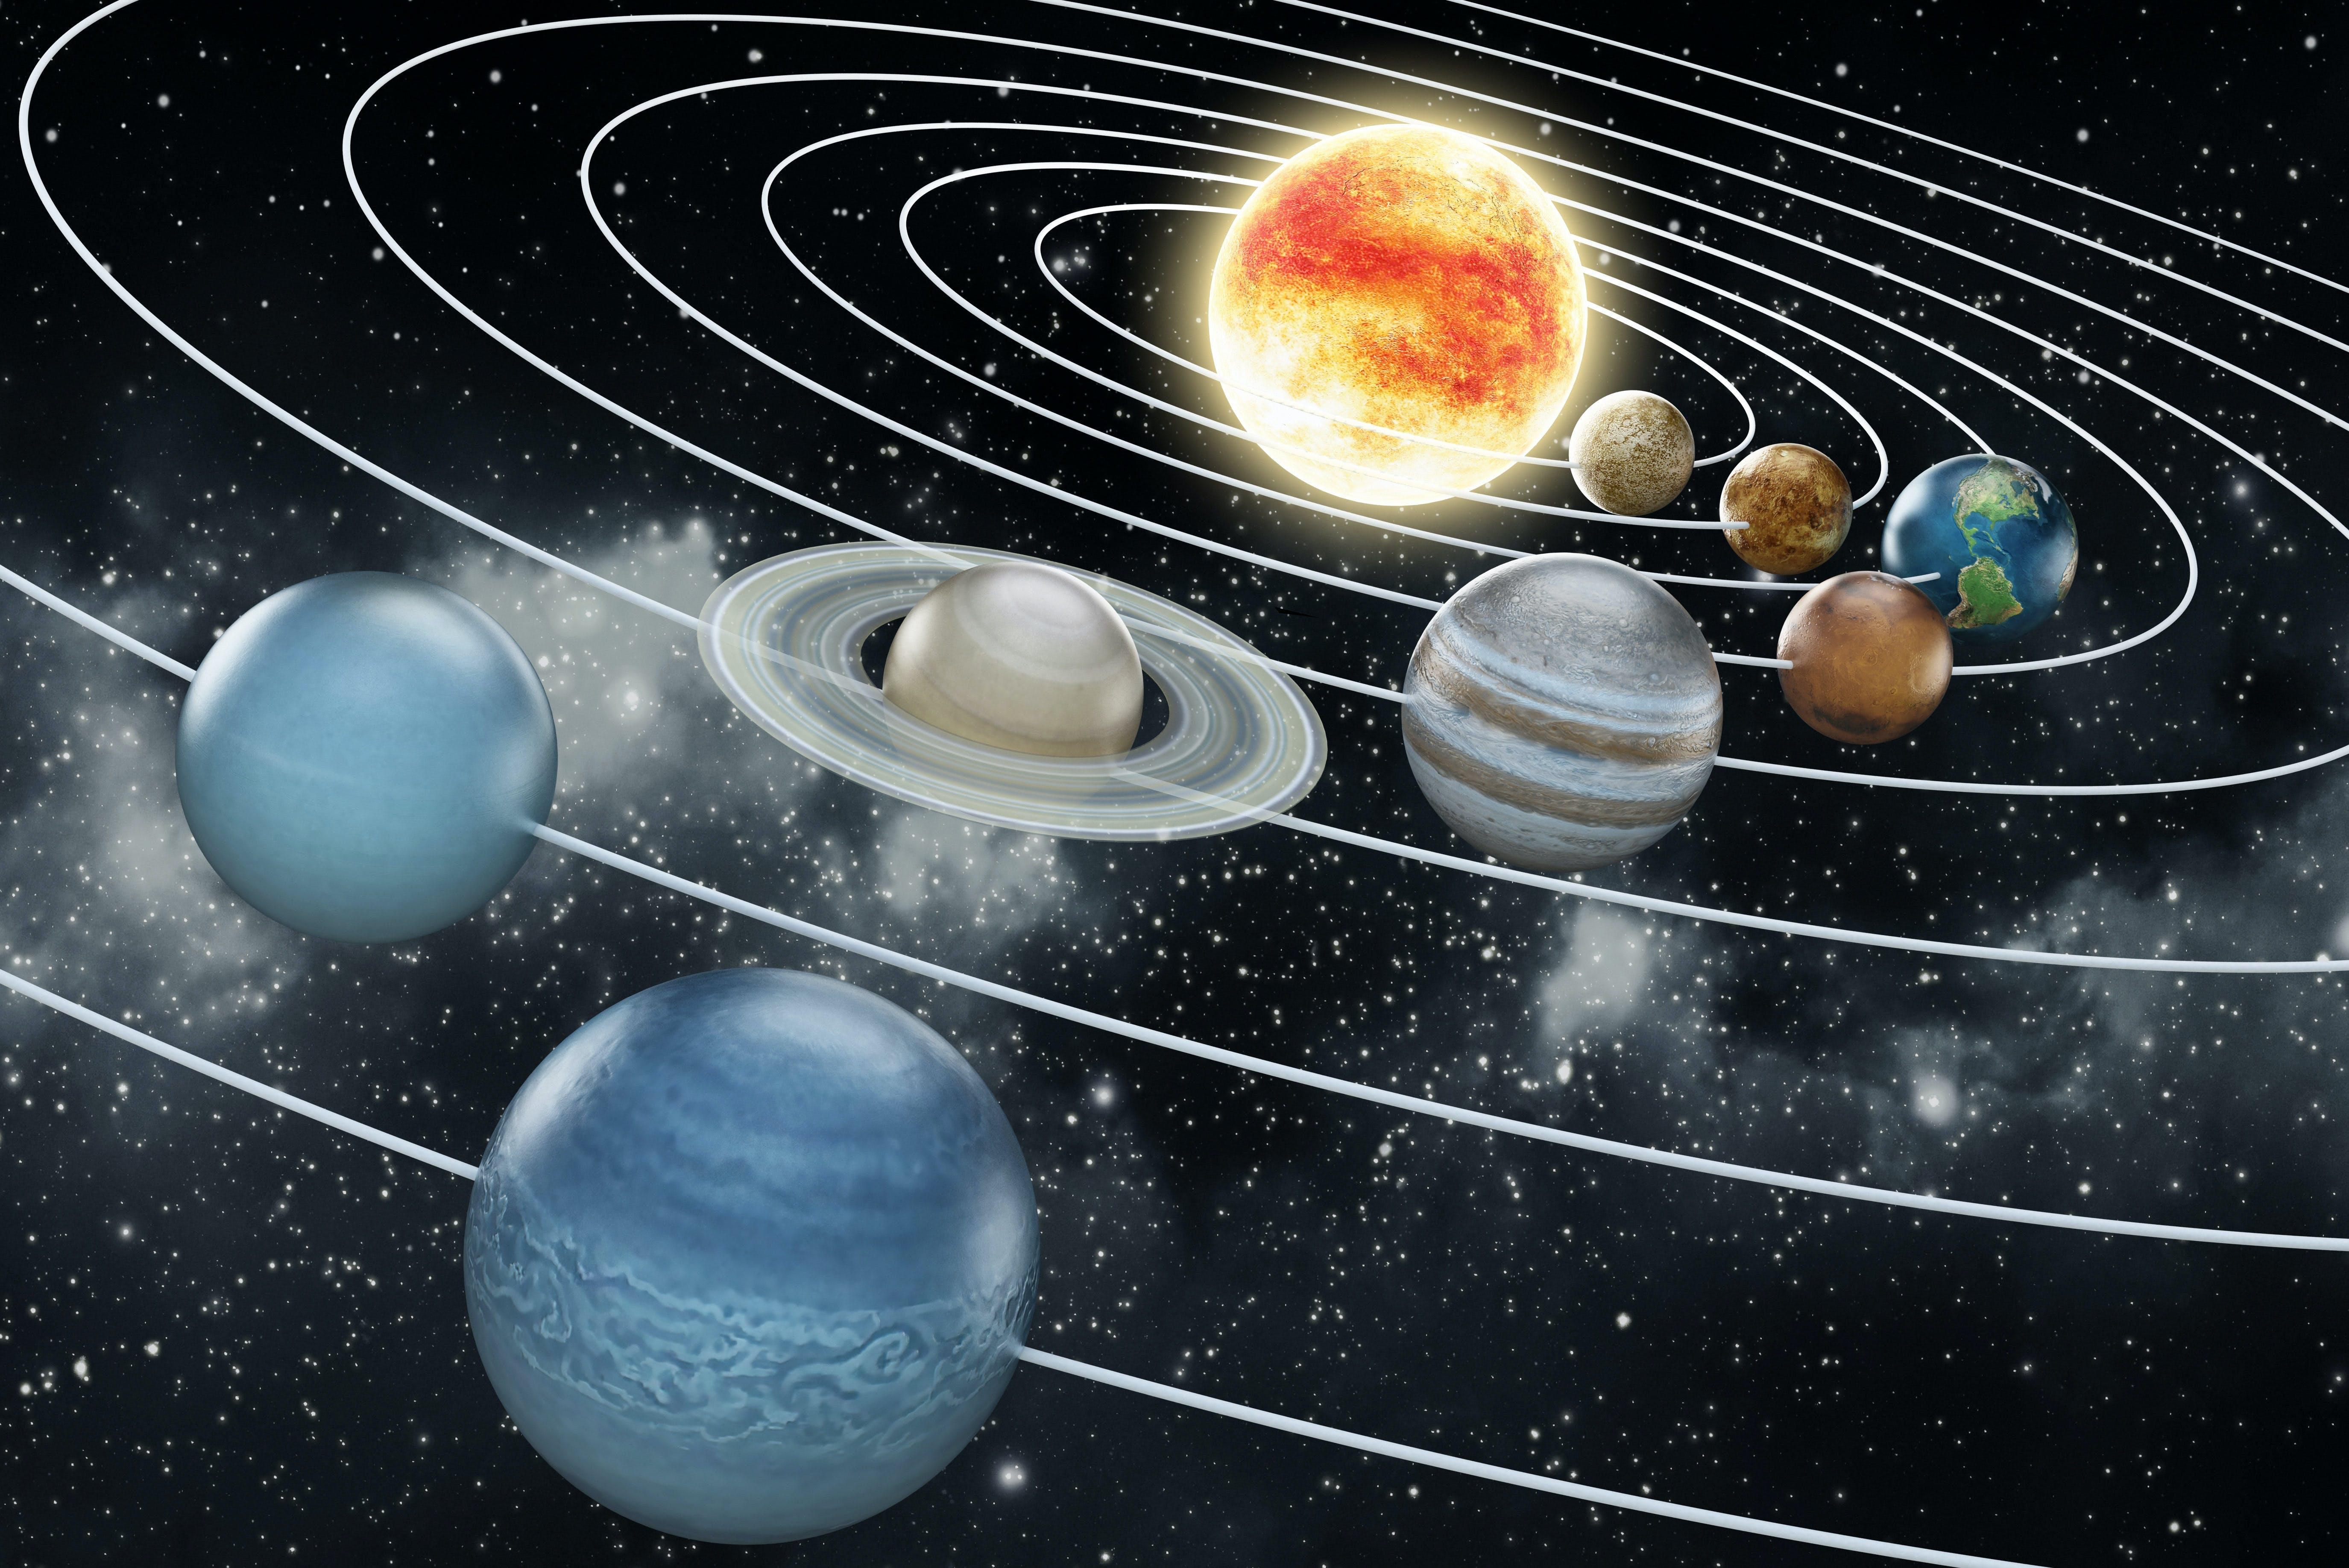 Weetjes over het zonnestelsel